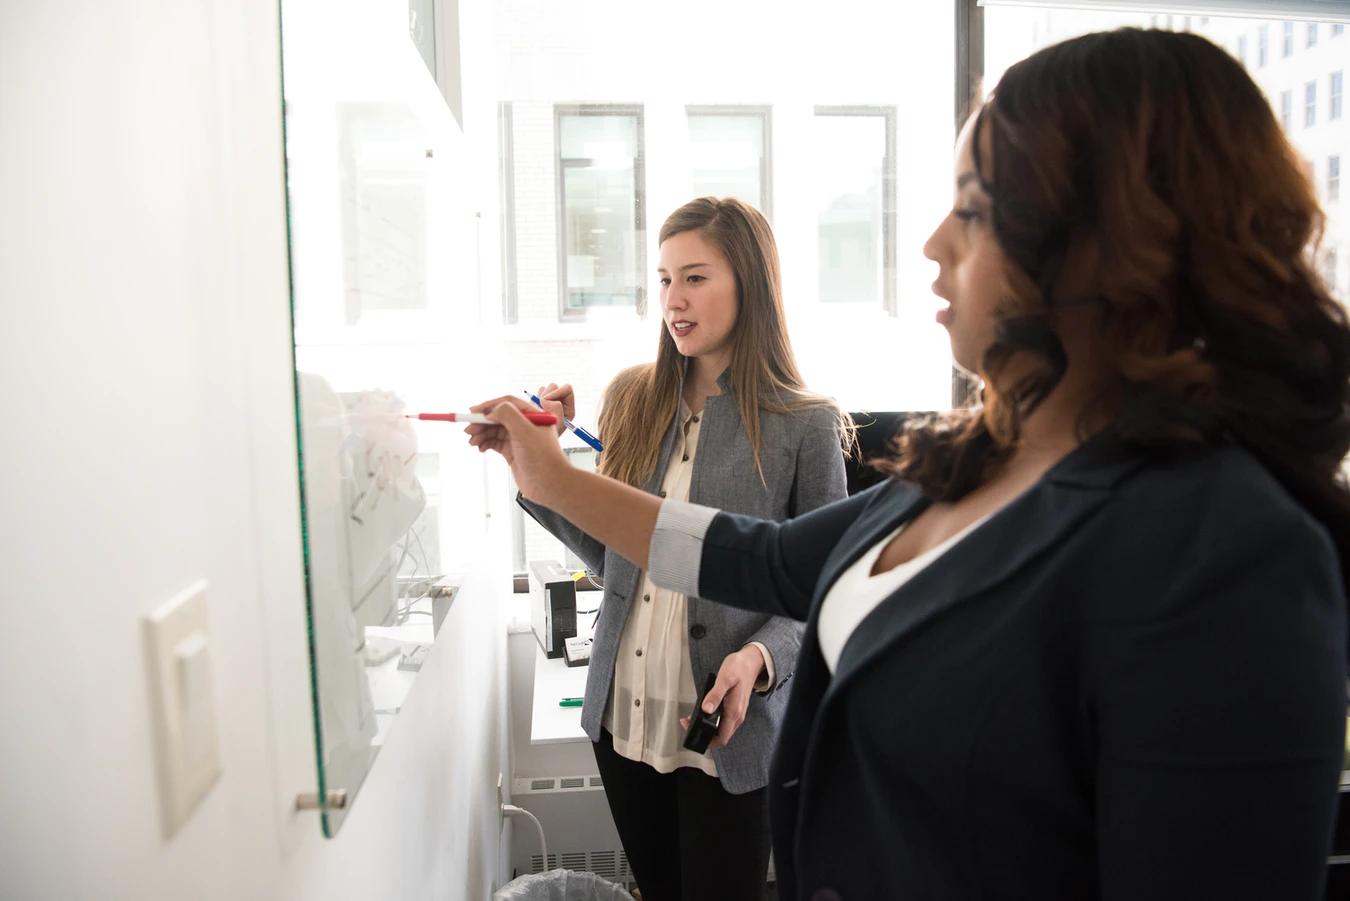 sales women writing on a whiteboard